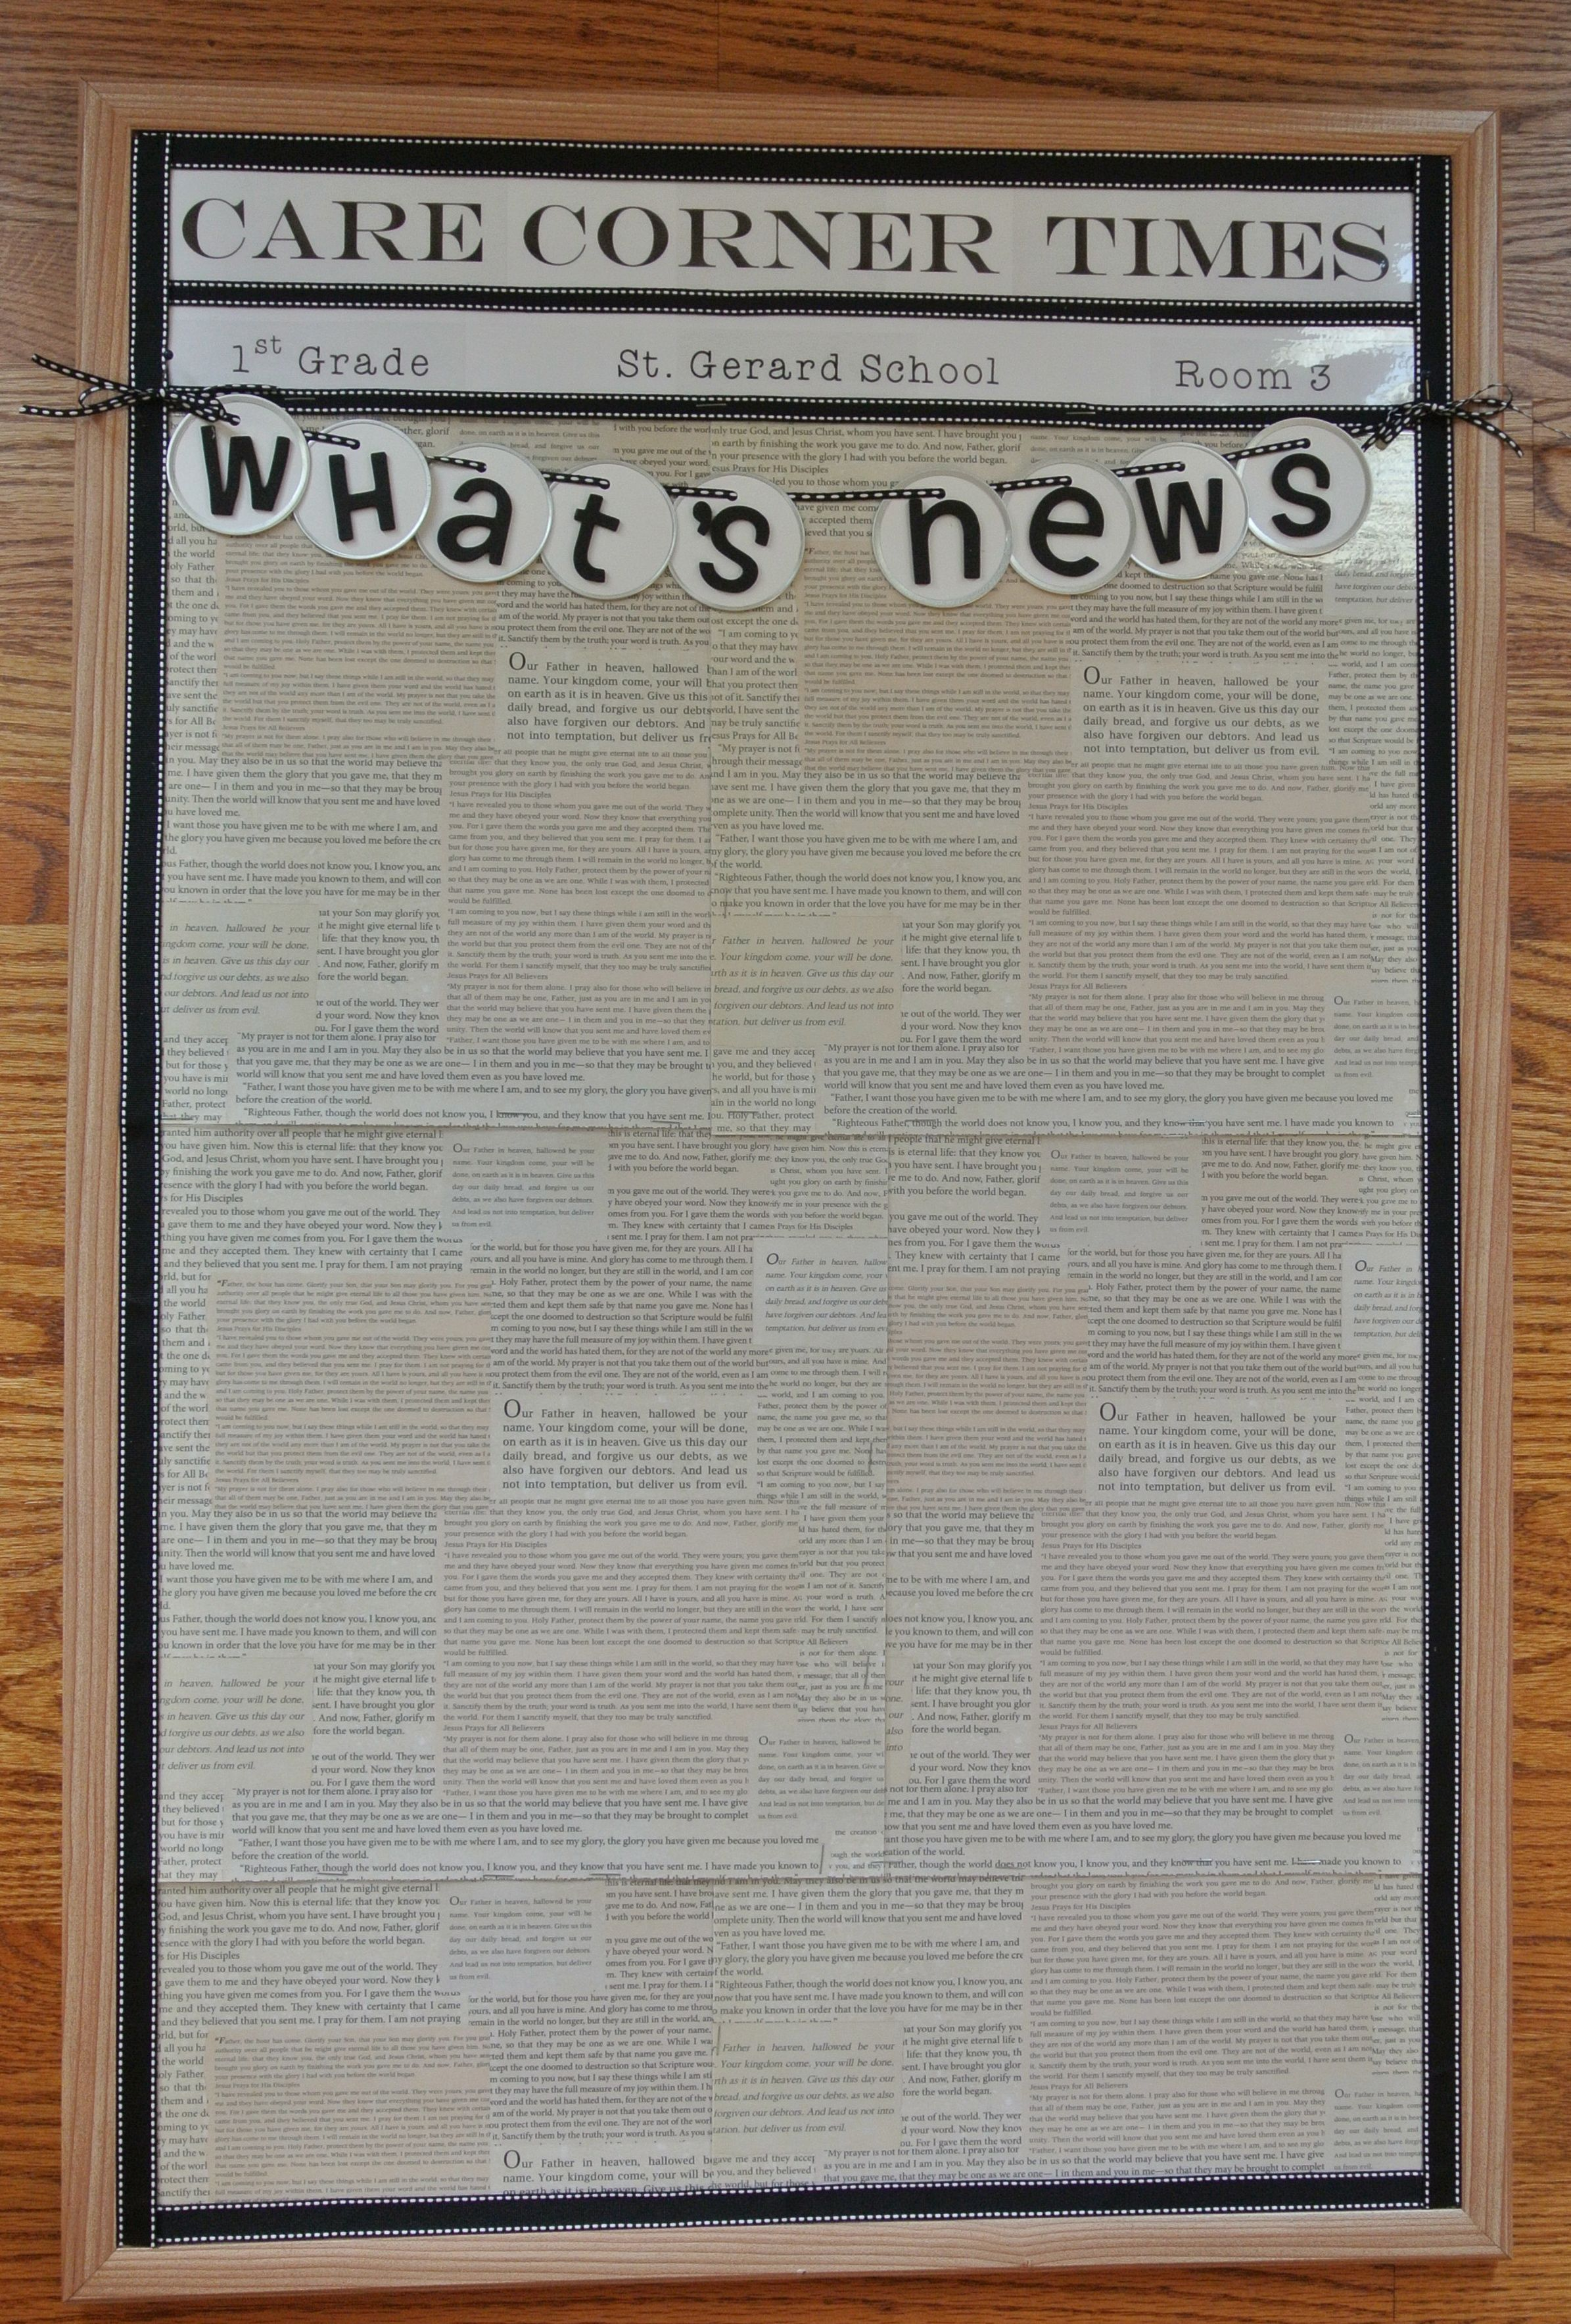 Classroom Newspaper Ideas ~ What s news quot newspaper bulletin board small framed